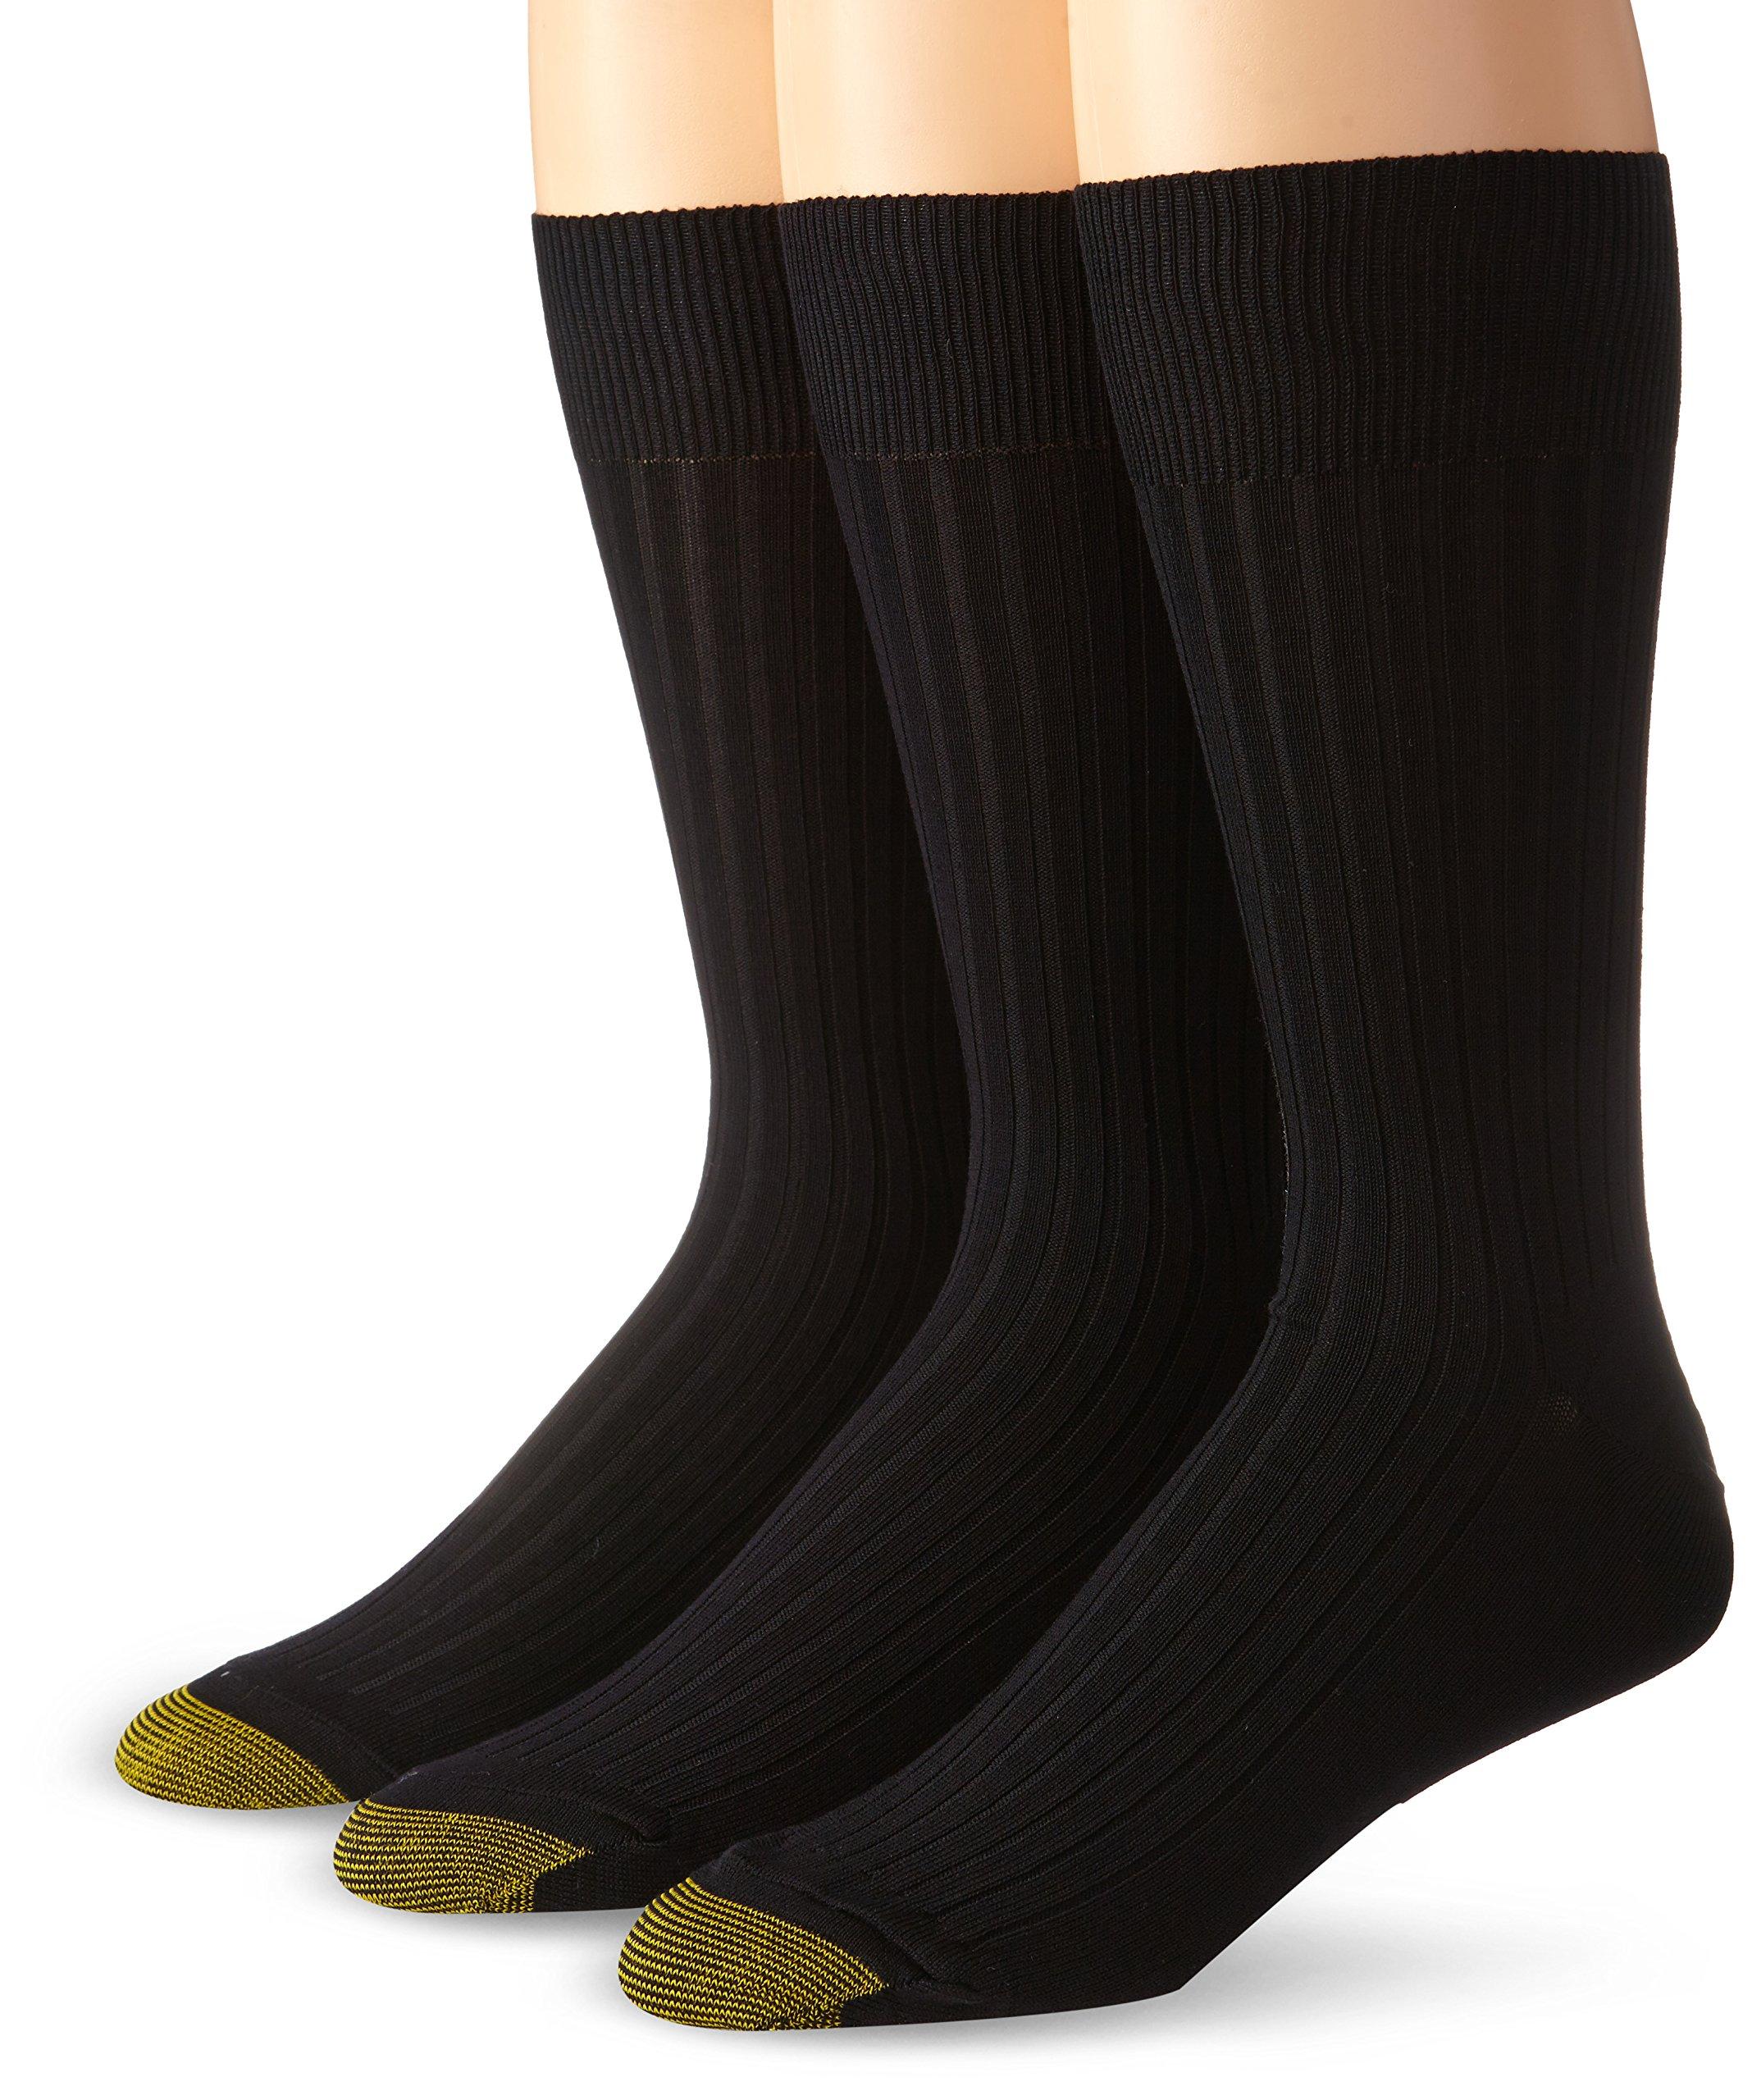 Gold Toe Men's Canterbury Dress Sock, Black, 3-Pack Sock Size 10-13(Shoe Size 6-12.5) by Gold Toe